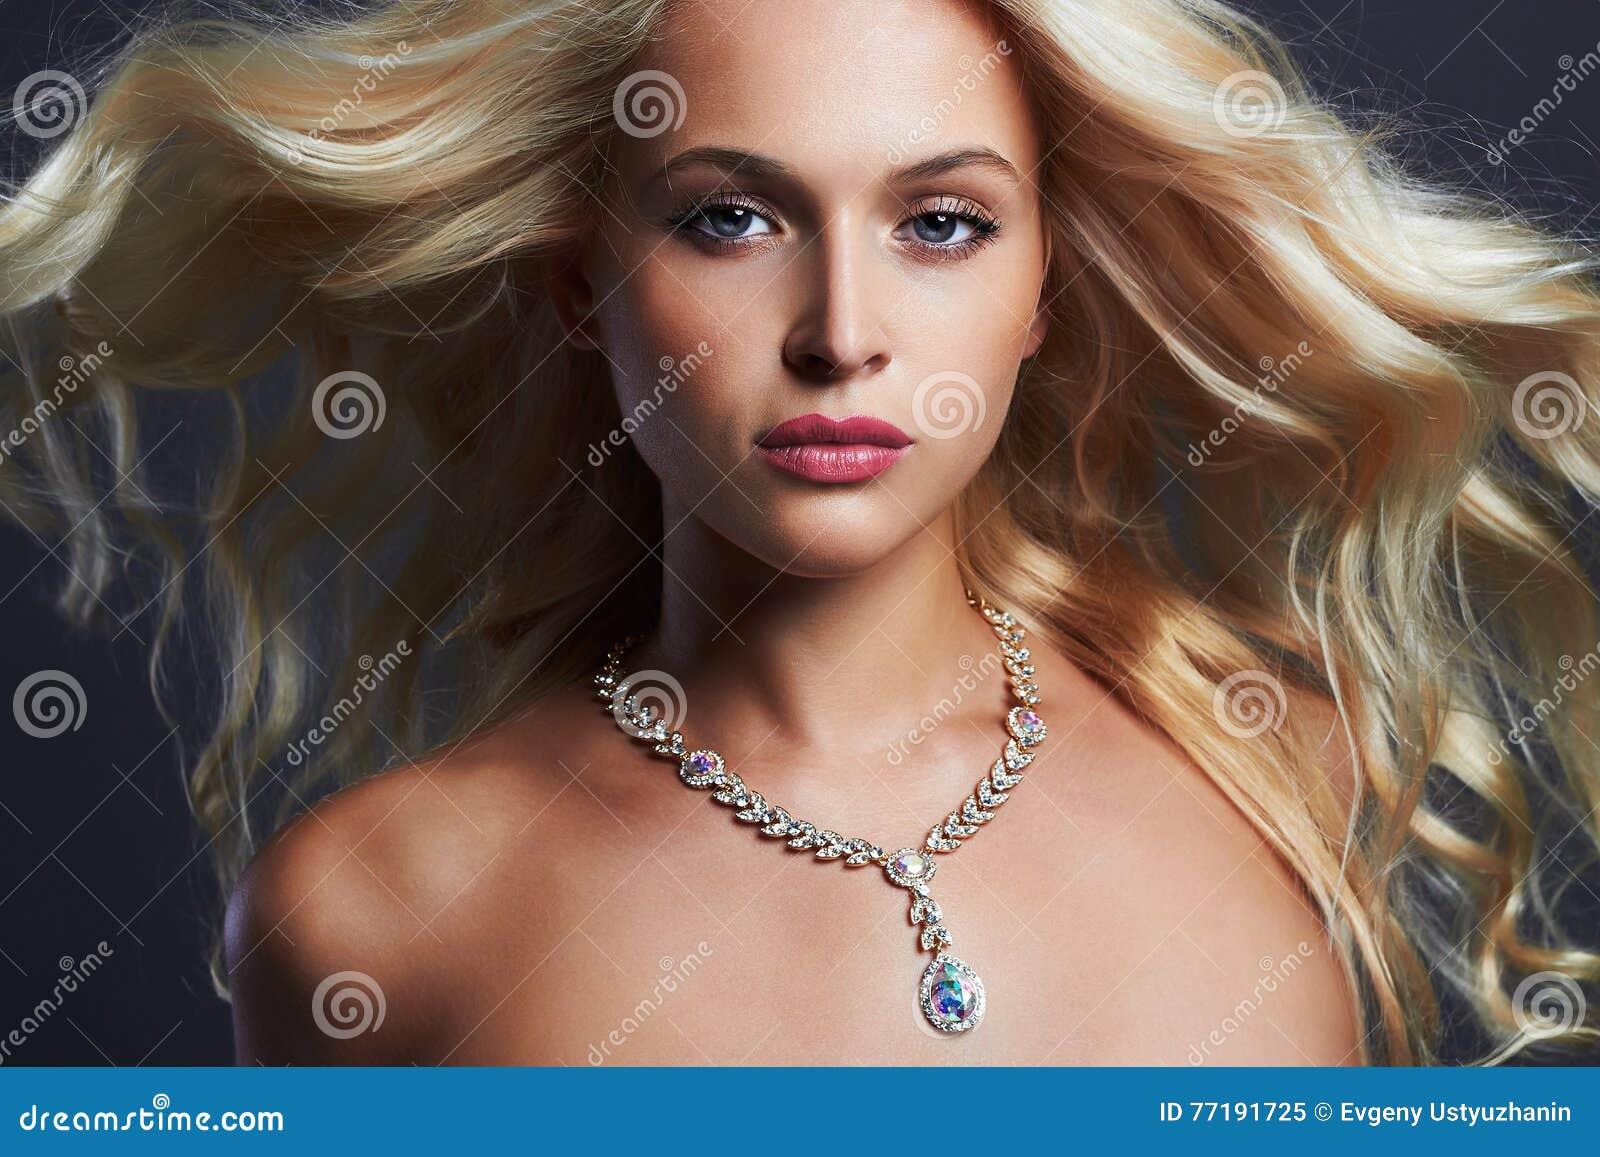 Young beautiful woman.Sexy Blond girl.jewelry